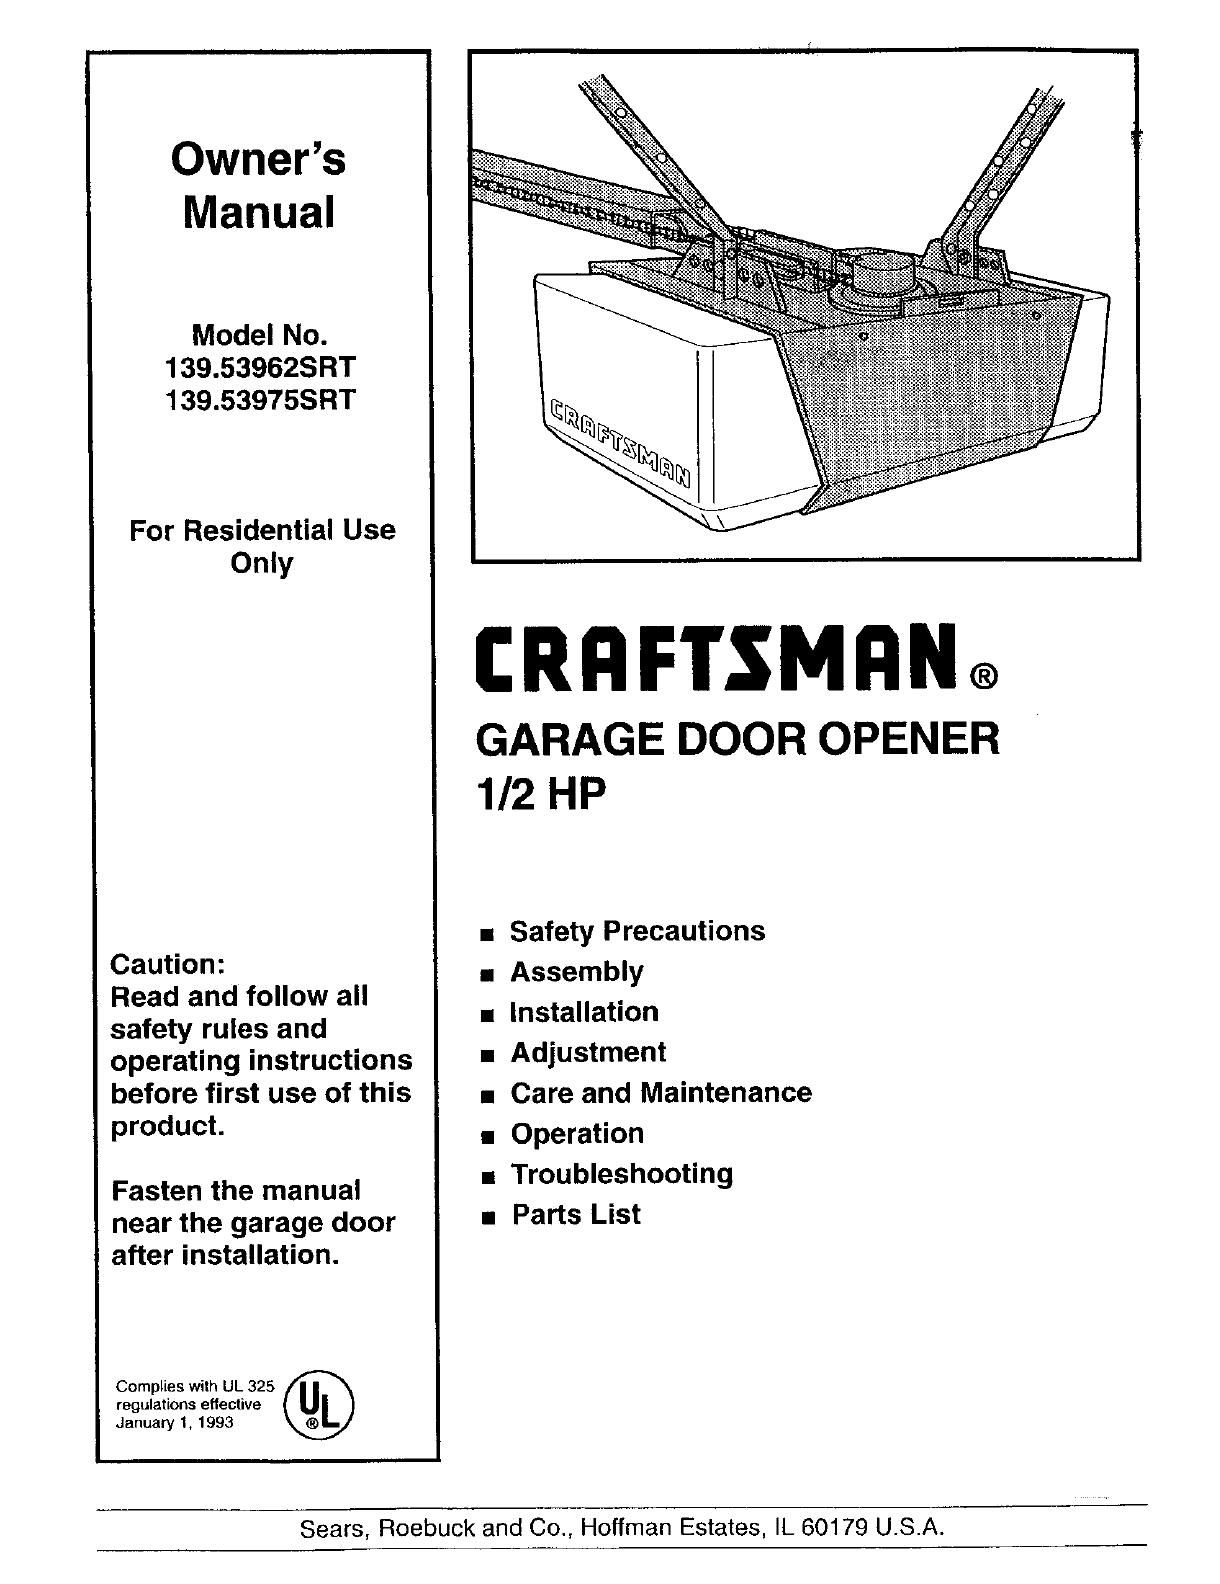 Craftsman 13953962srt User Manual Garage Door Opener Manuals And Guides L0310295